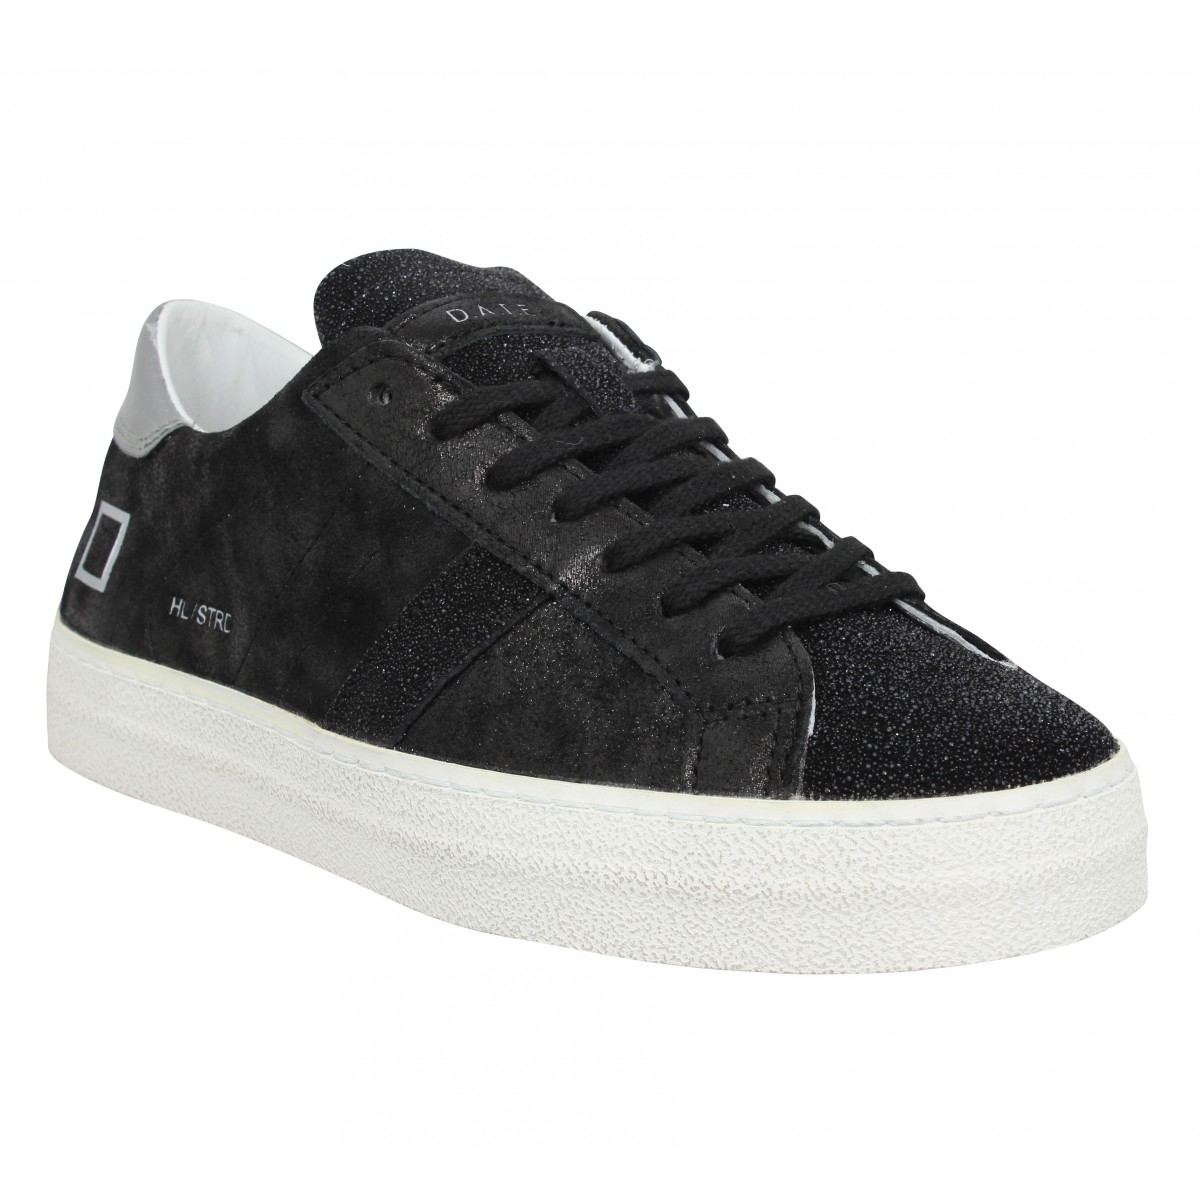 D.A.T.E Femme Date Sneakers Hill Low...